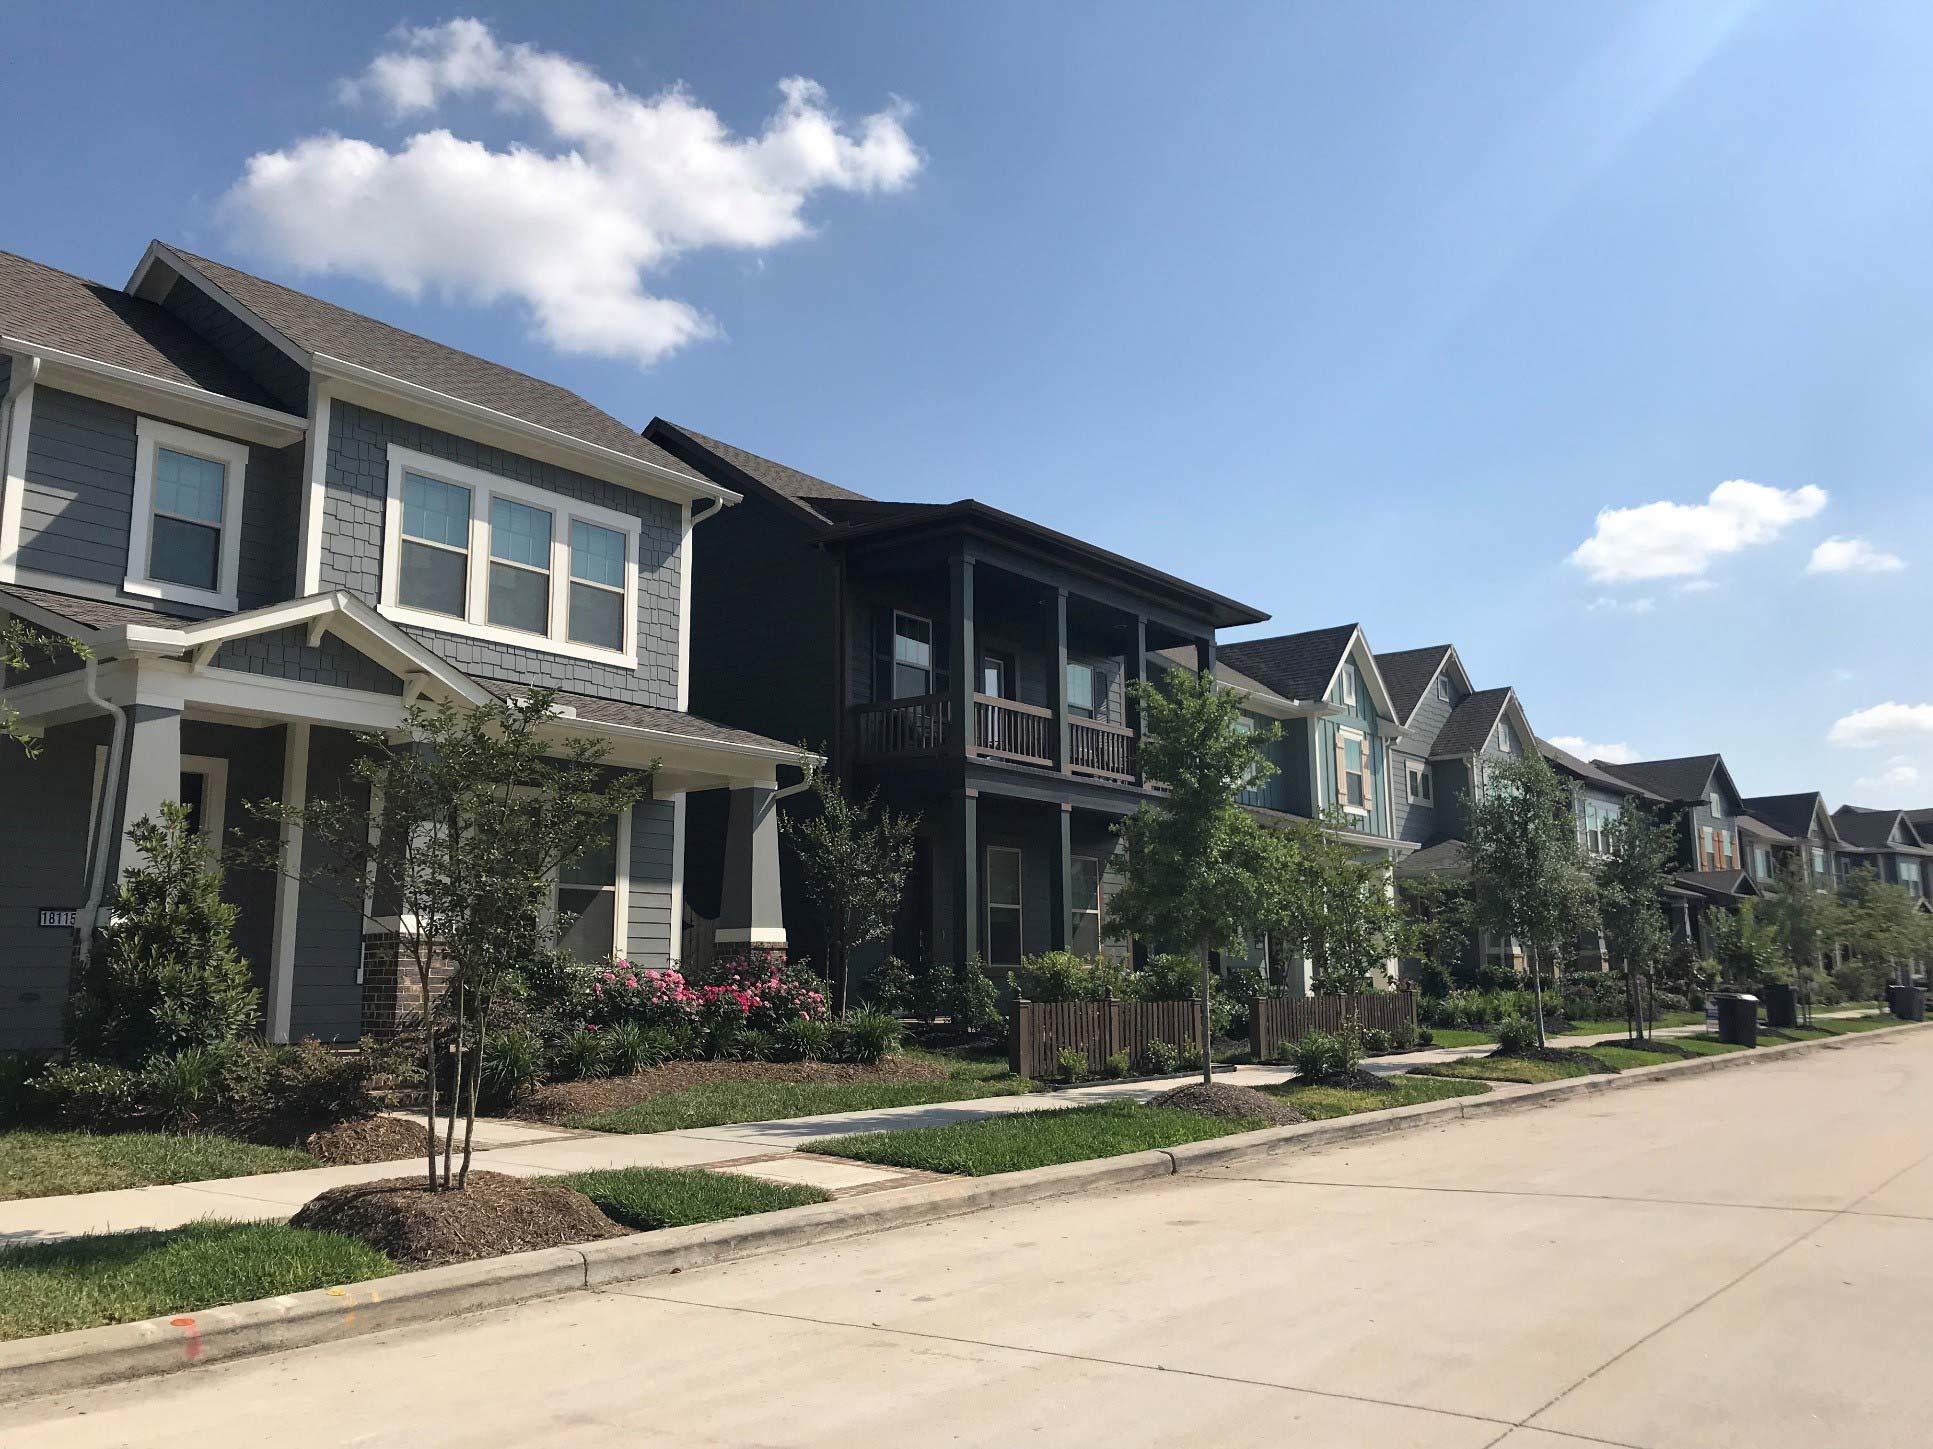 Beau Sienna Plantation   Leafwing Meadow 34u0027 Missouri City TX Home Builder, New  Homes   David Weekley Homes